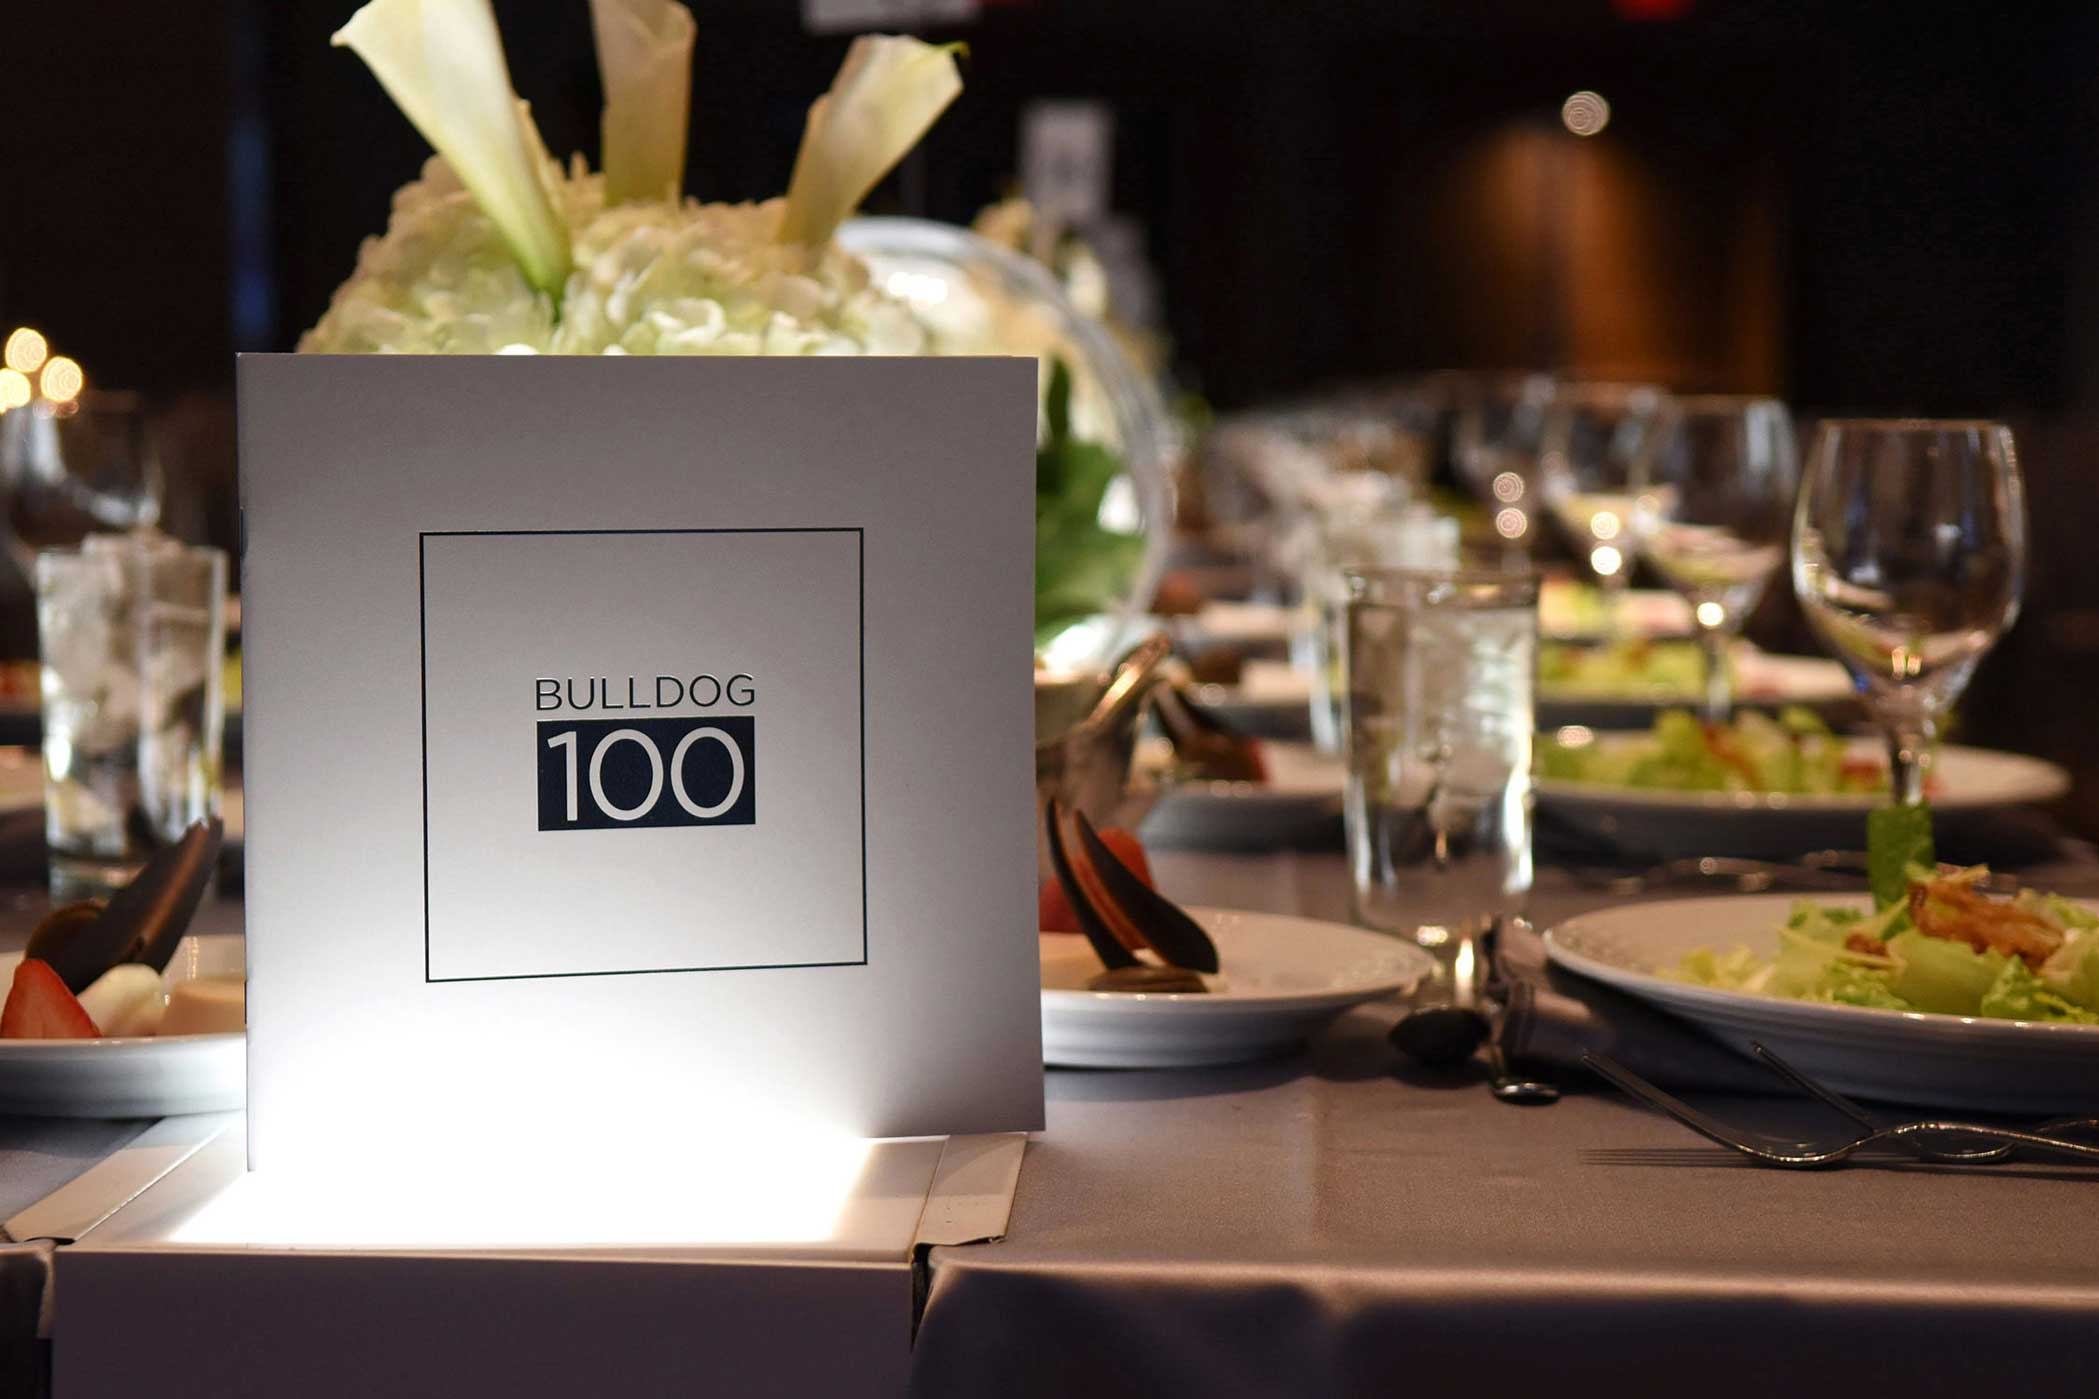 Bulldog 100 Banquet